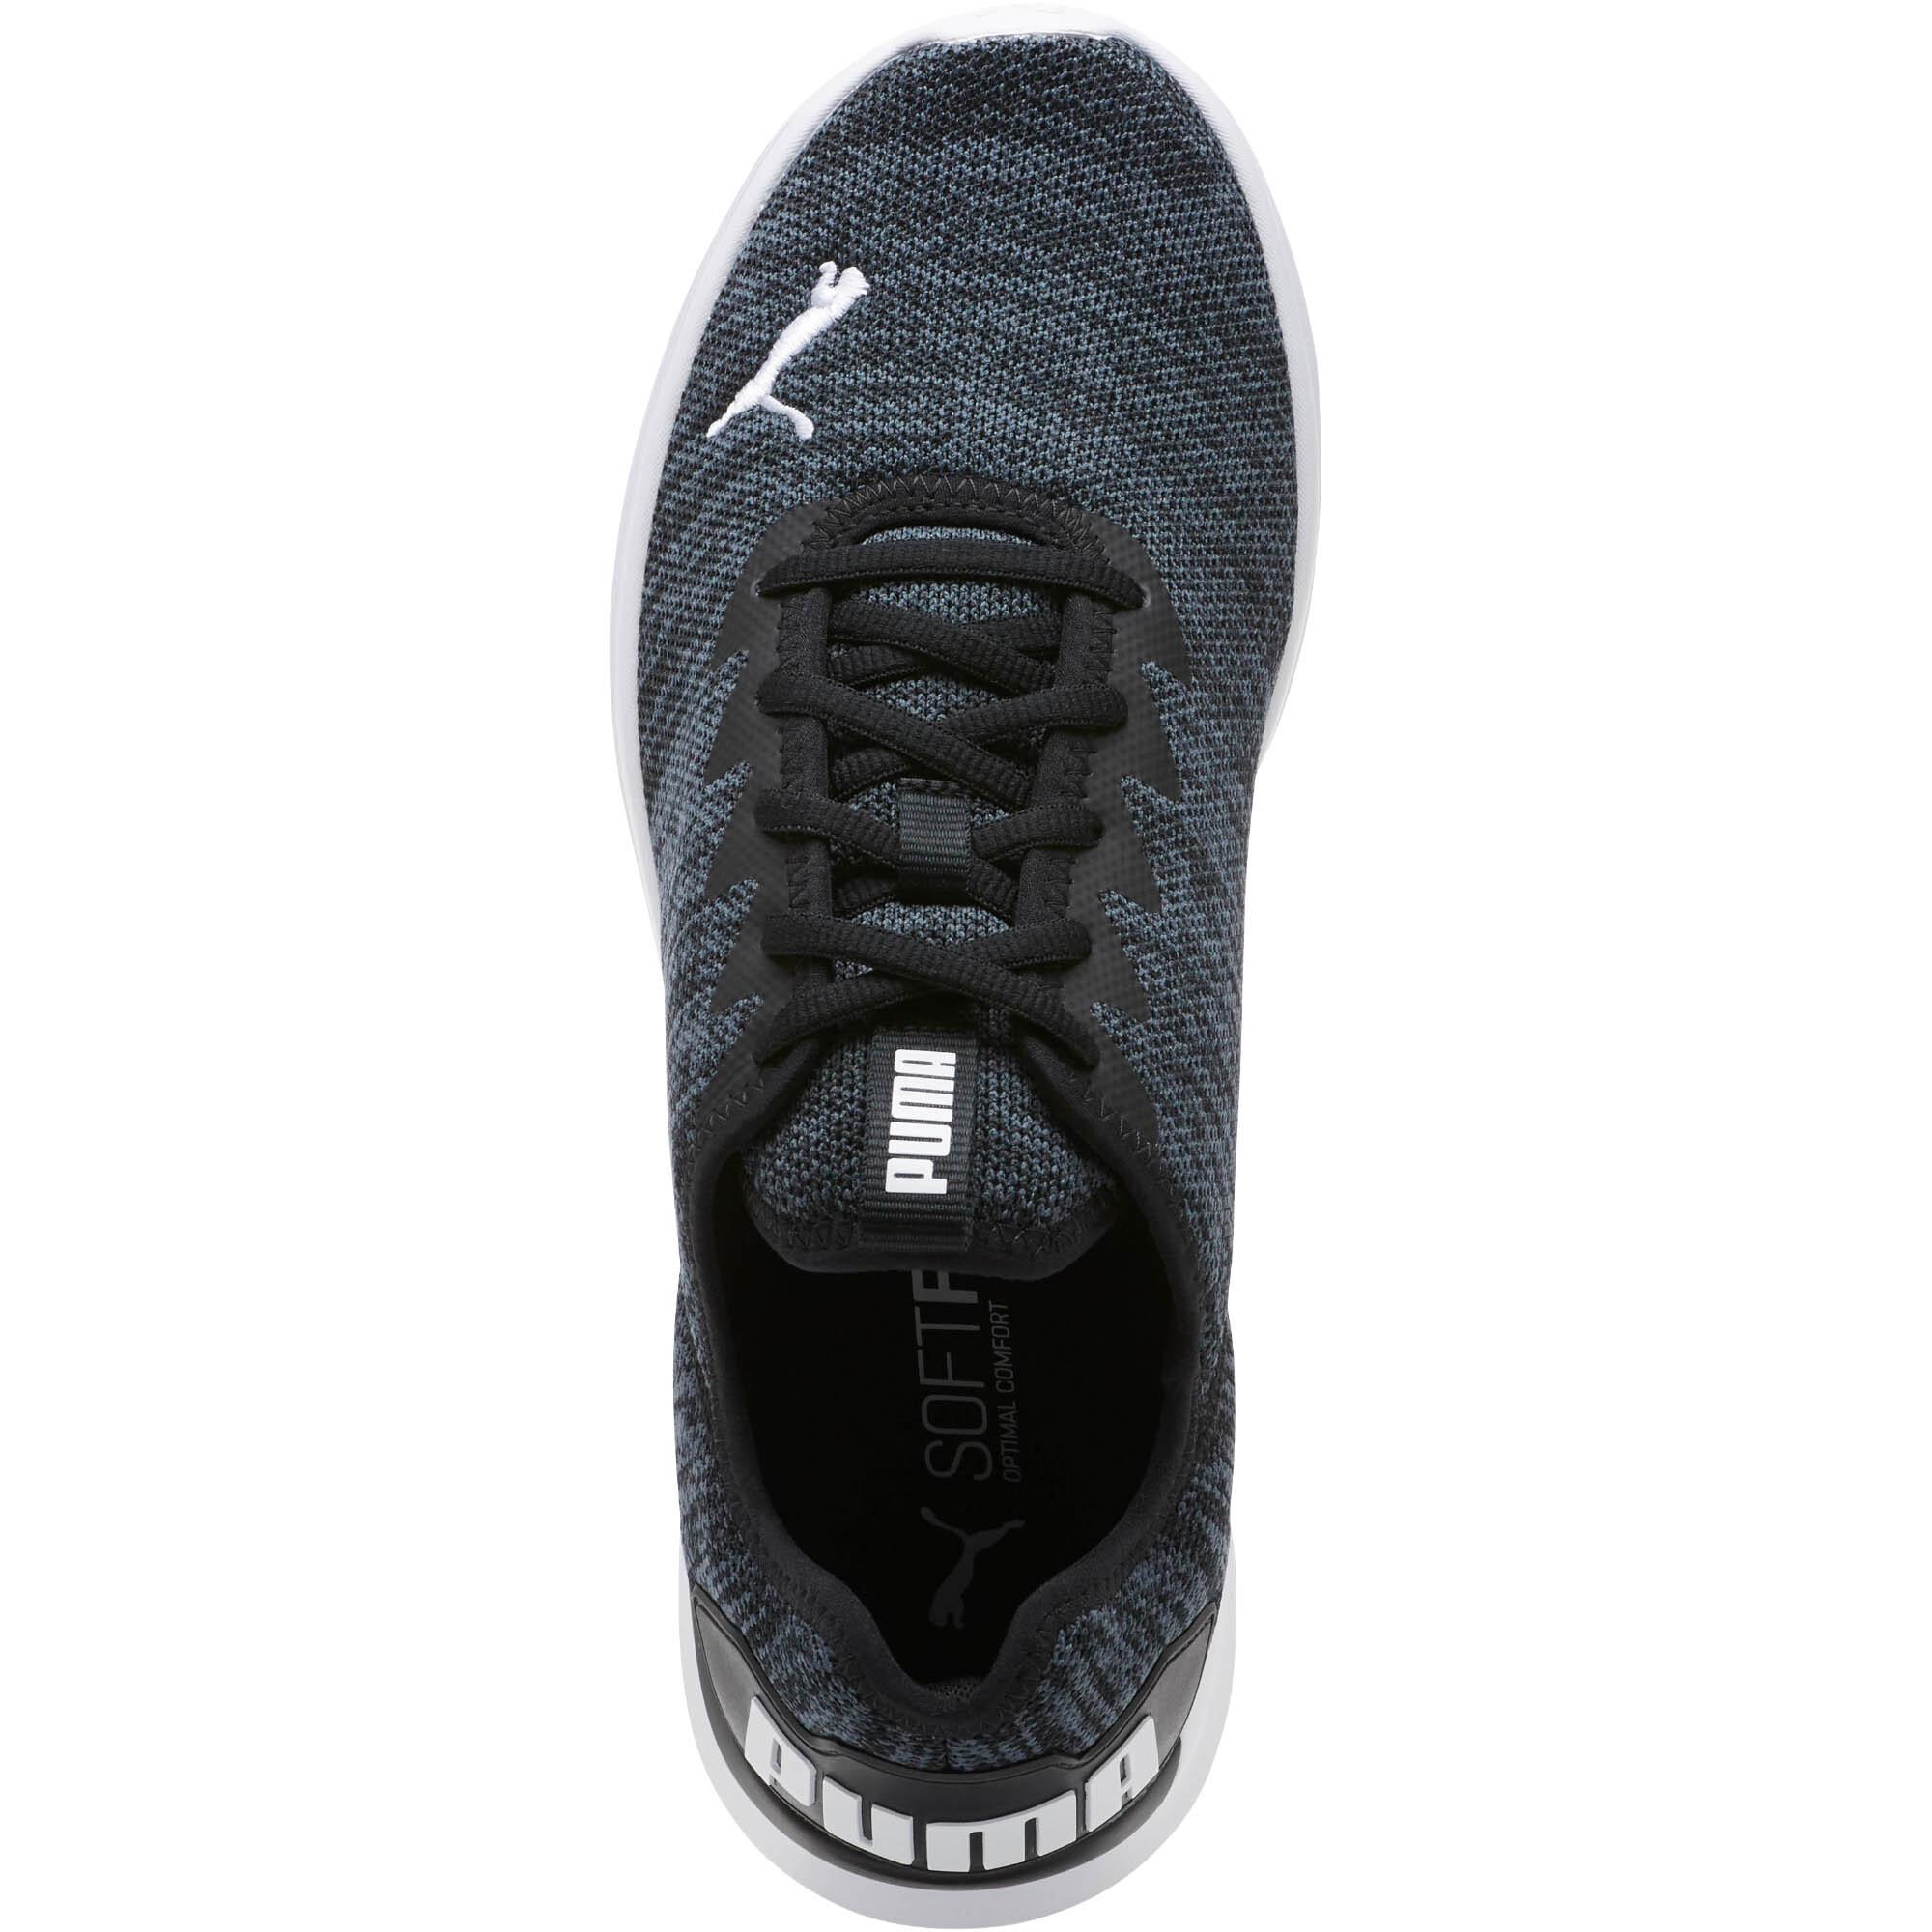 PUMA-Ballast-Men-039-s-Running-Shoes-Men-Shoe-Running thumbnail 13